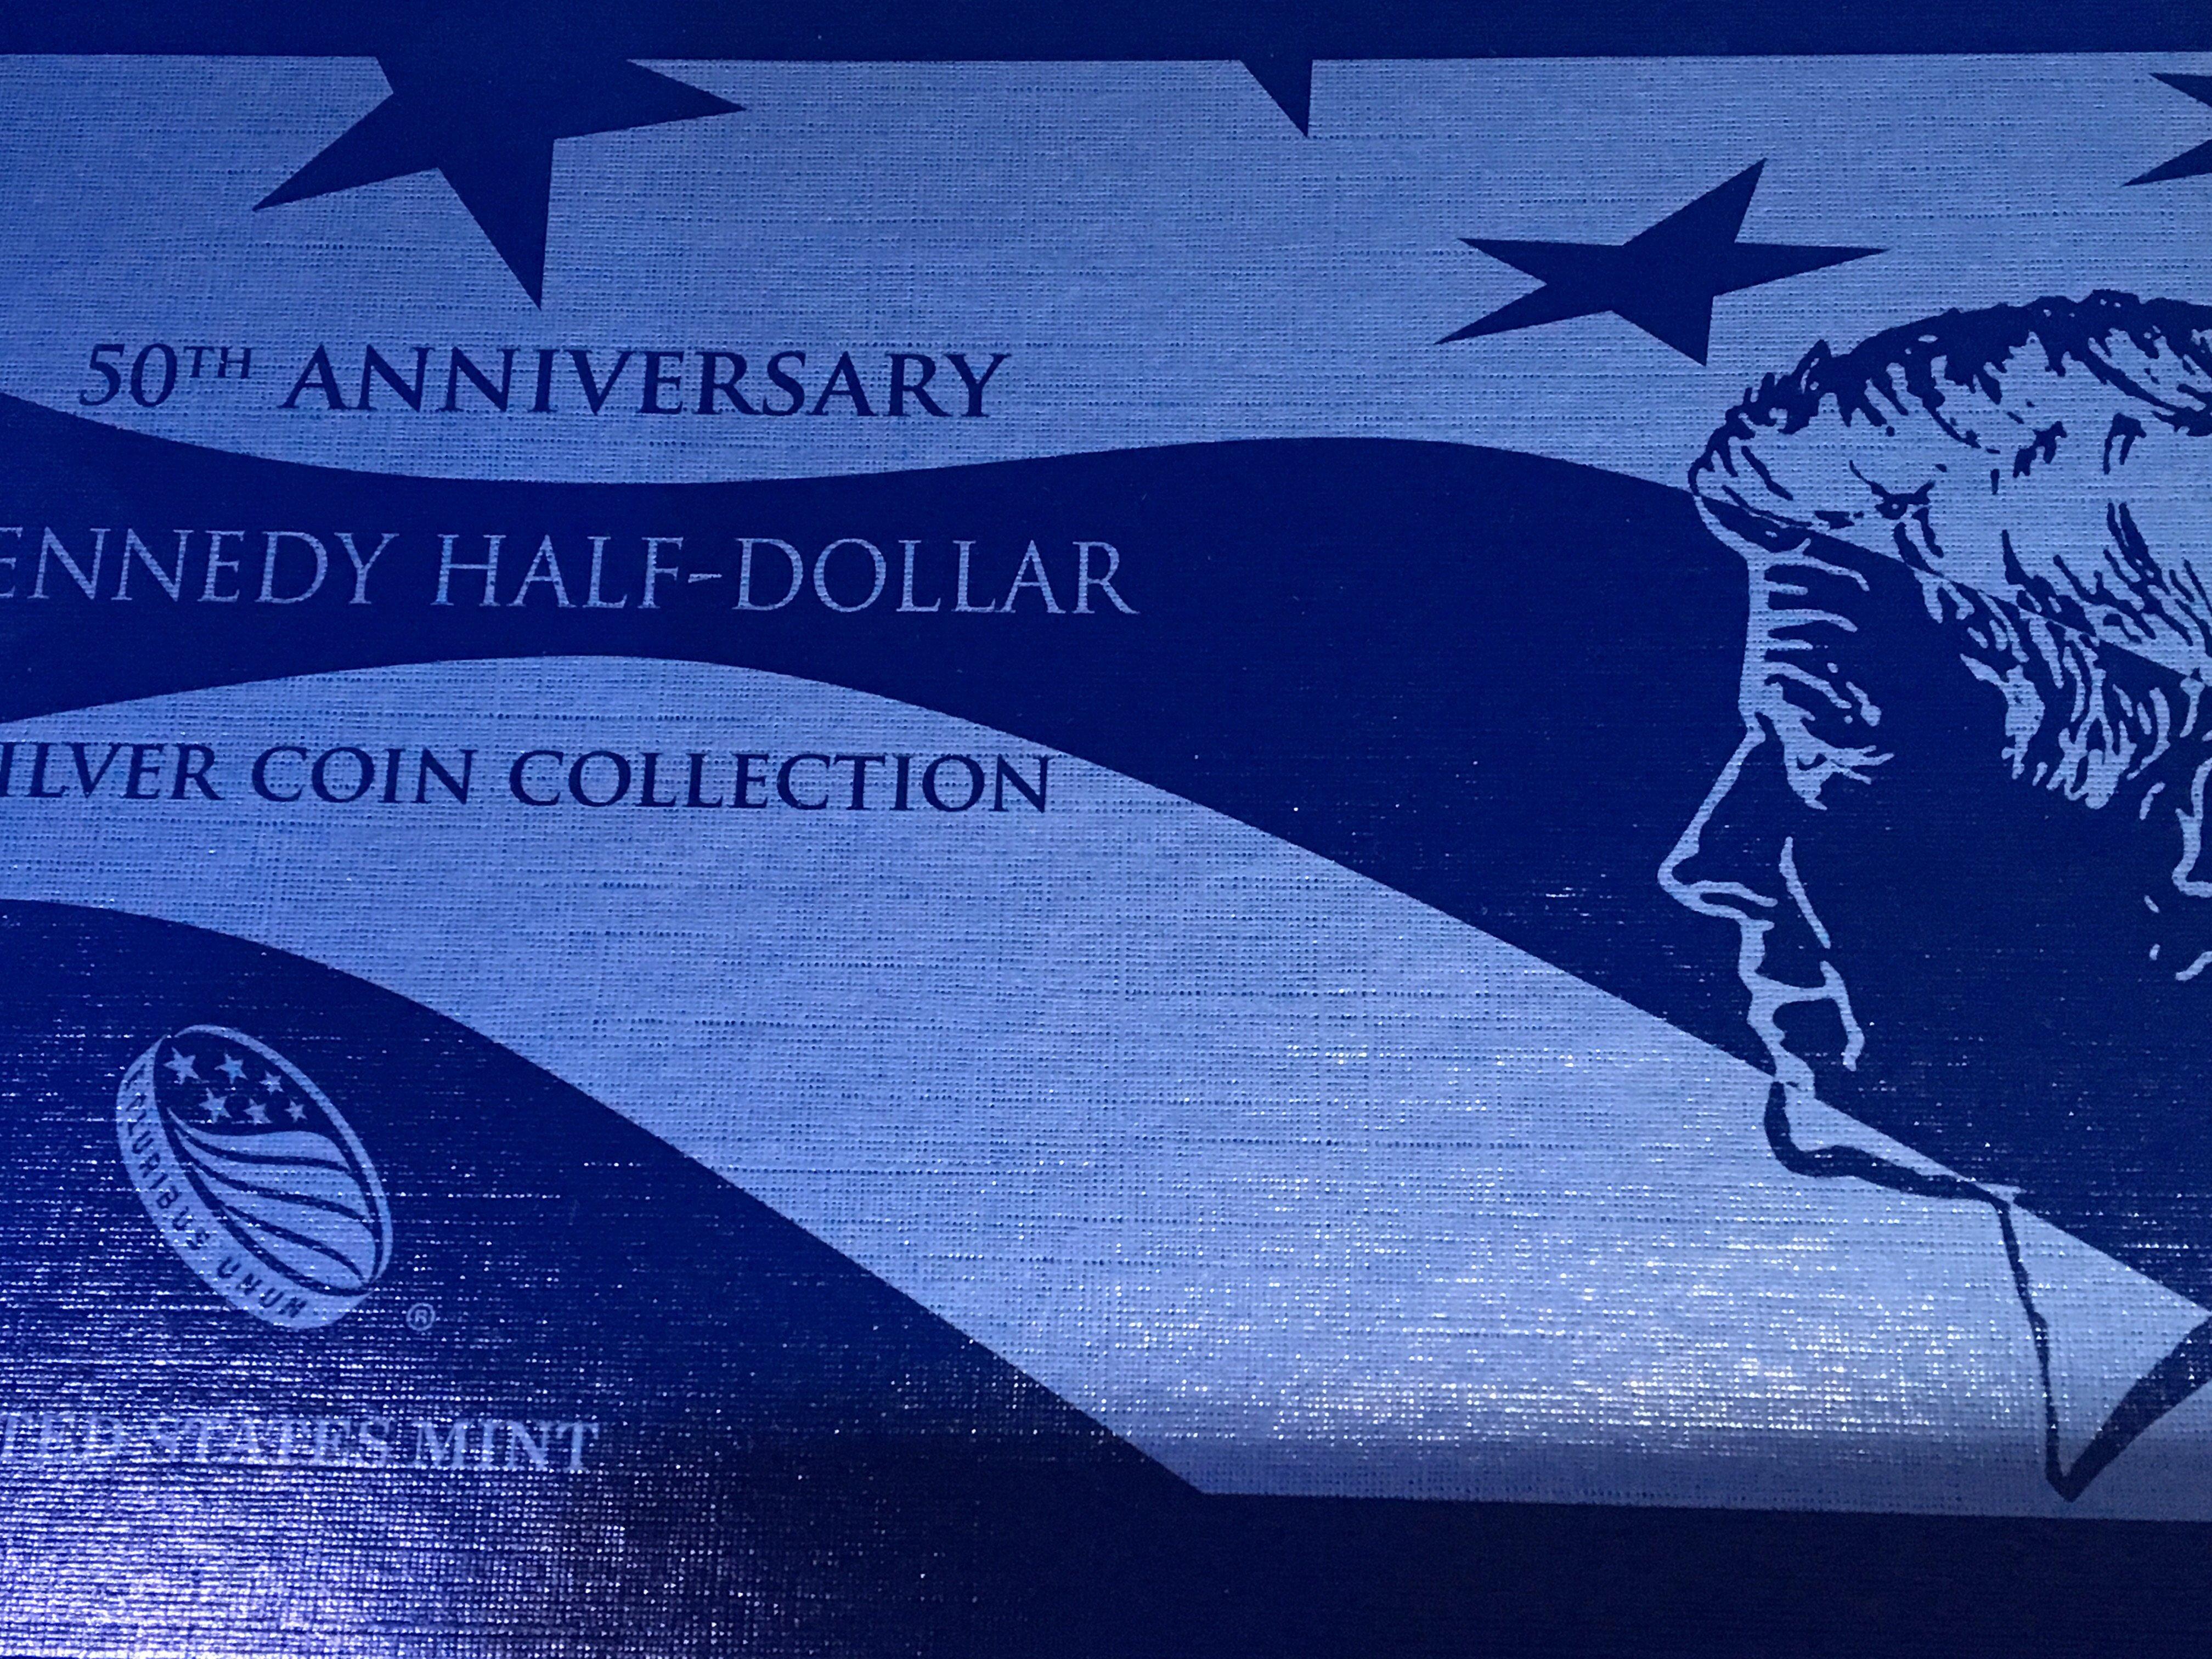 Lot 143 - A 2014 American 50th Anniversary Kennedy Half Doll